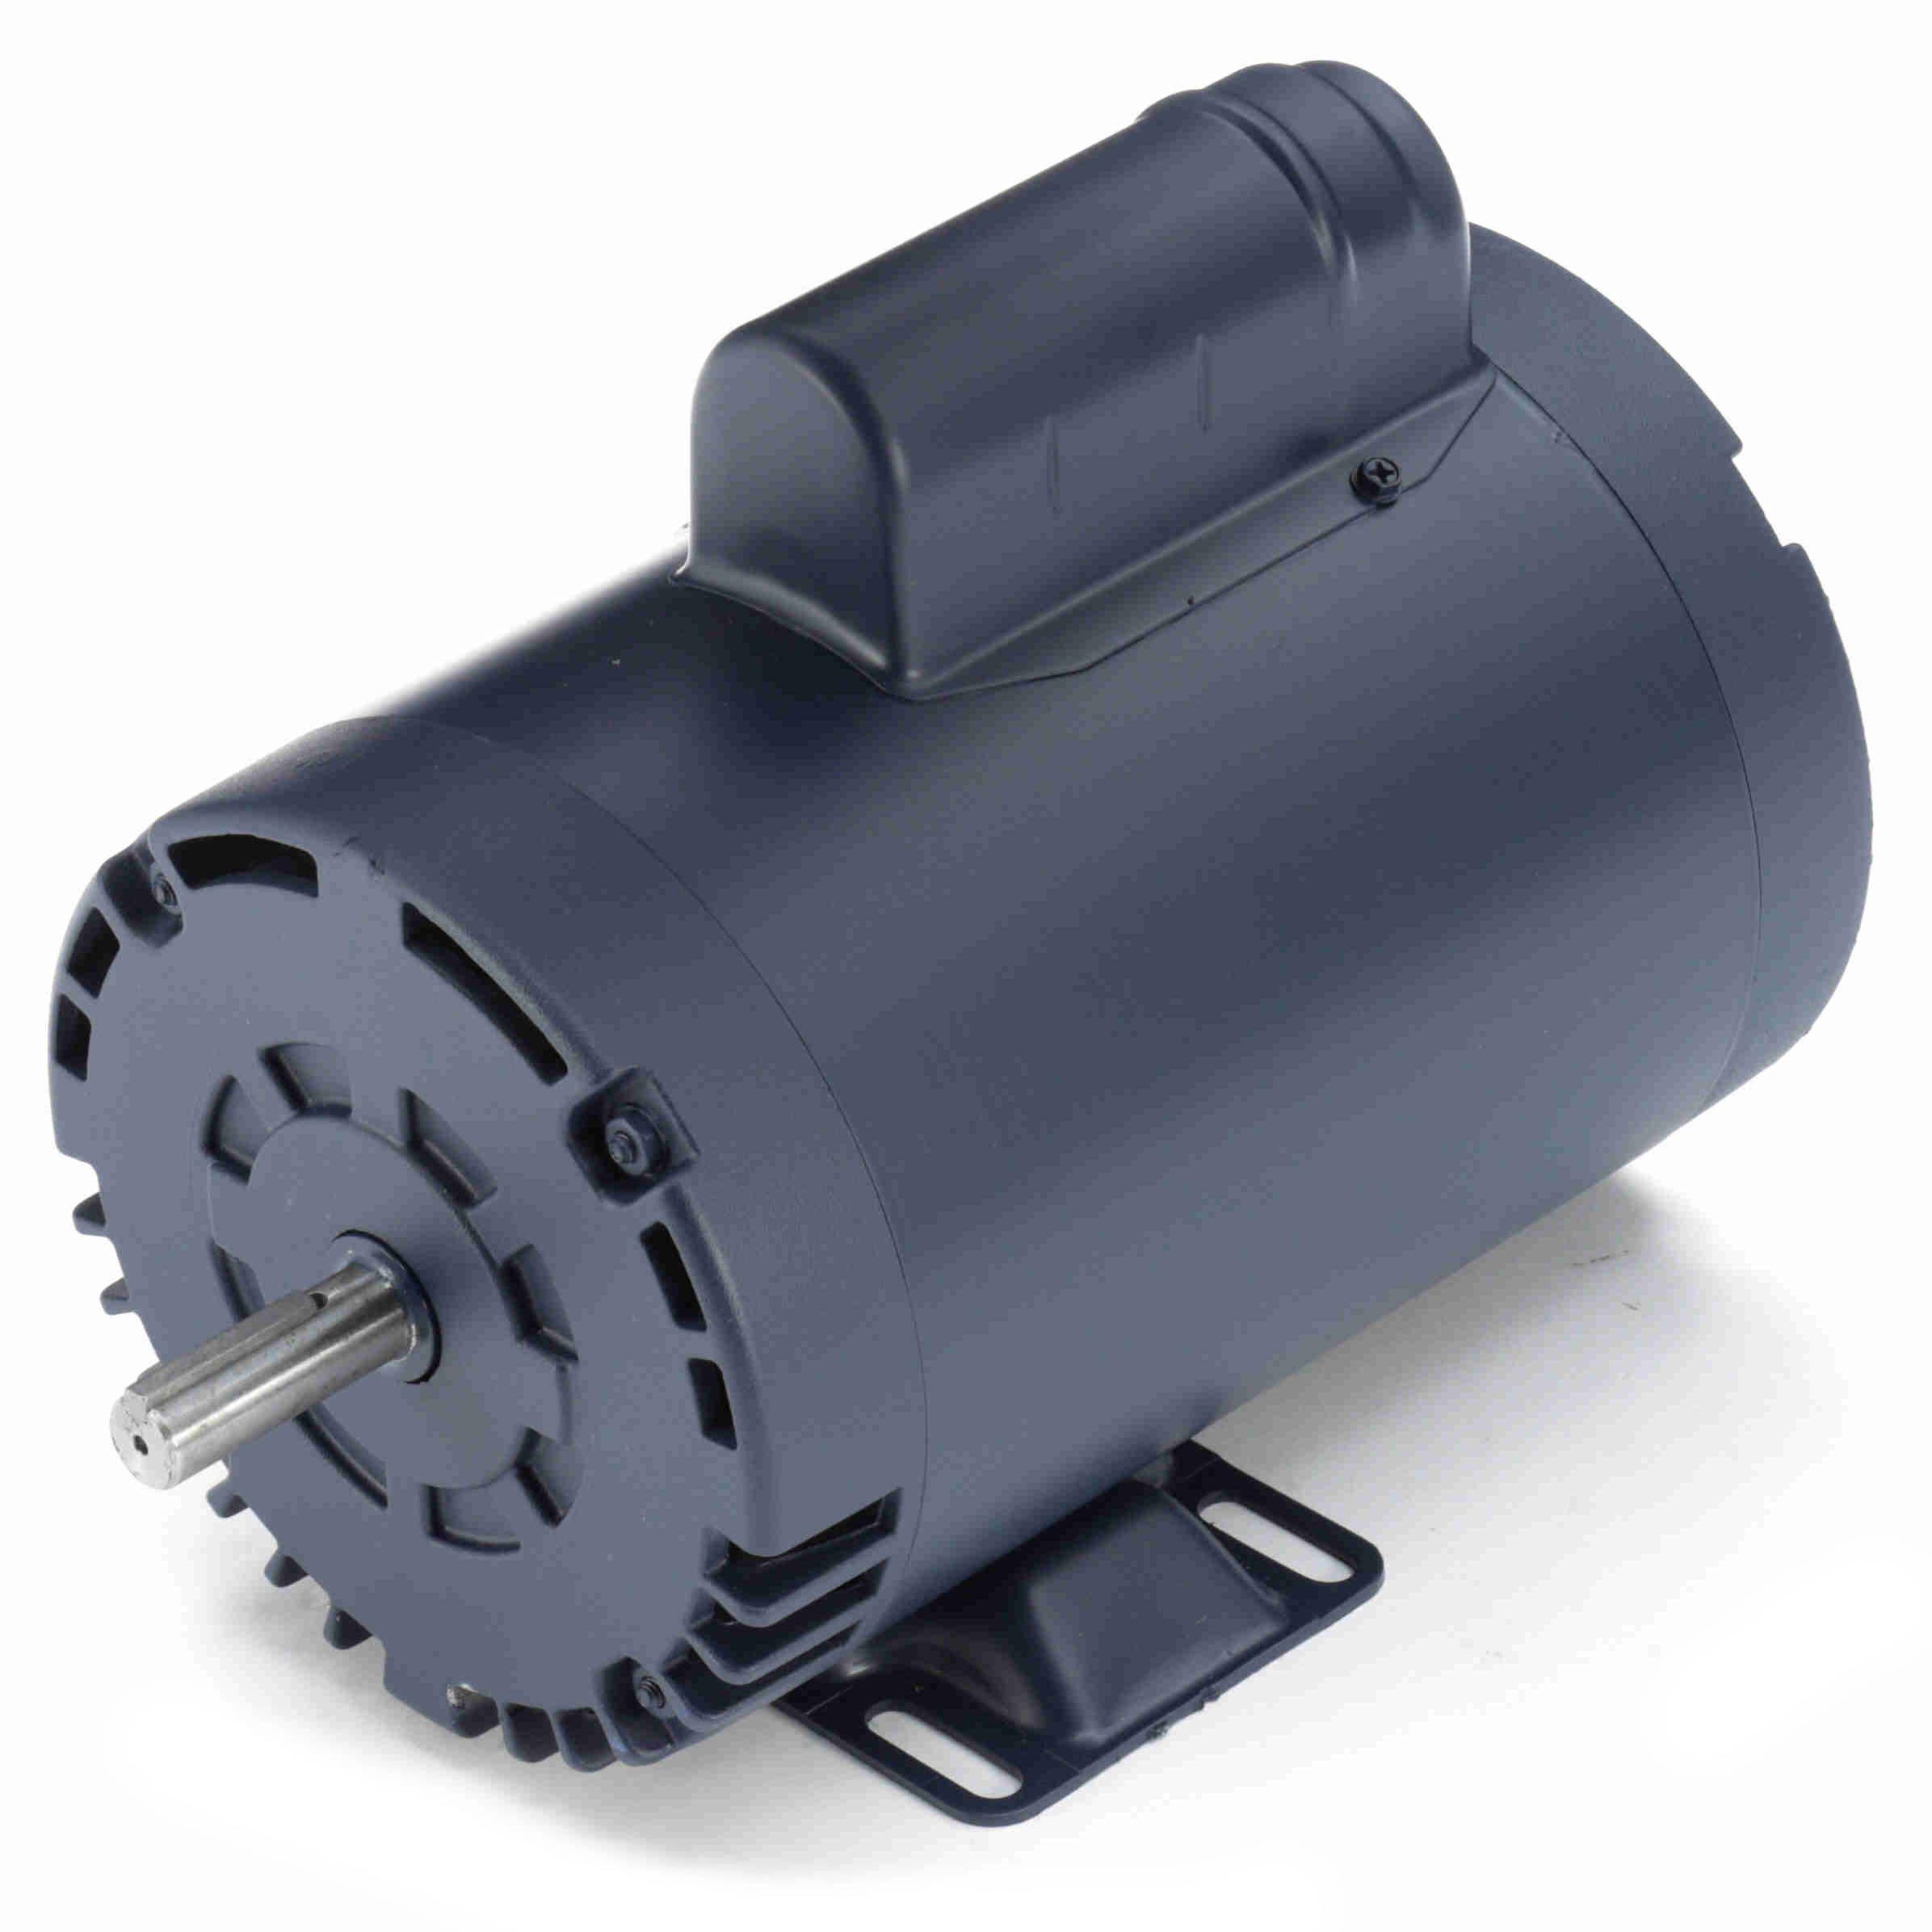 110222 00 Leeson 3HP Compressor Duty Electric Motor, 3600 RPM